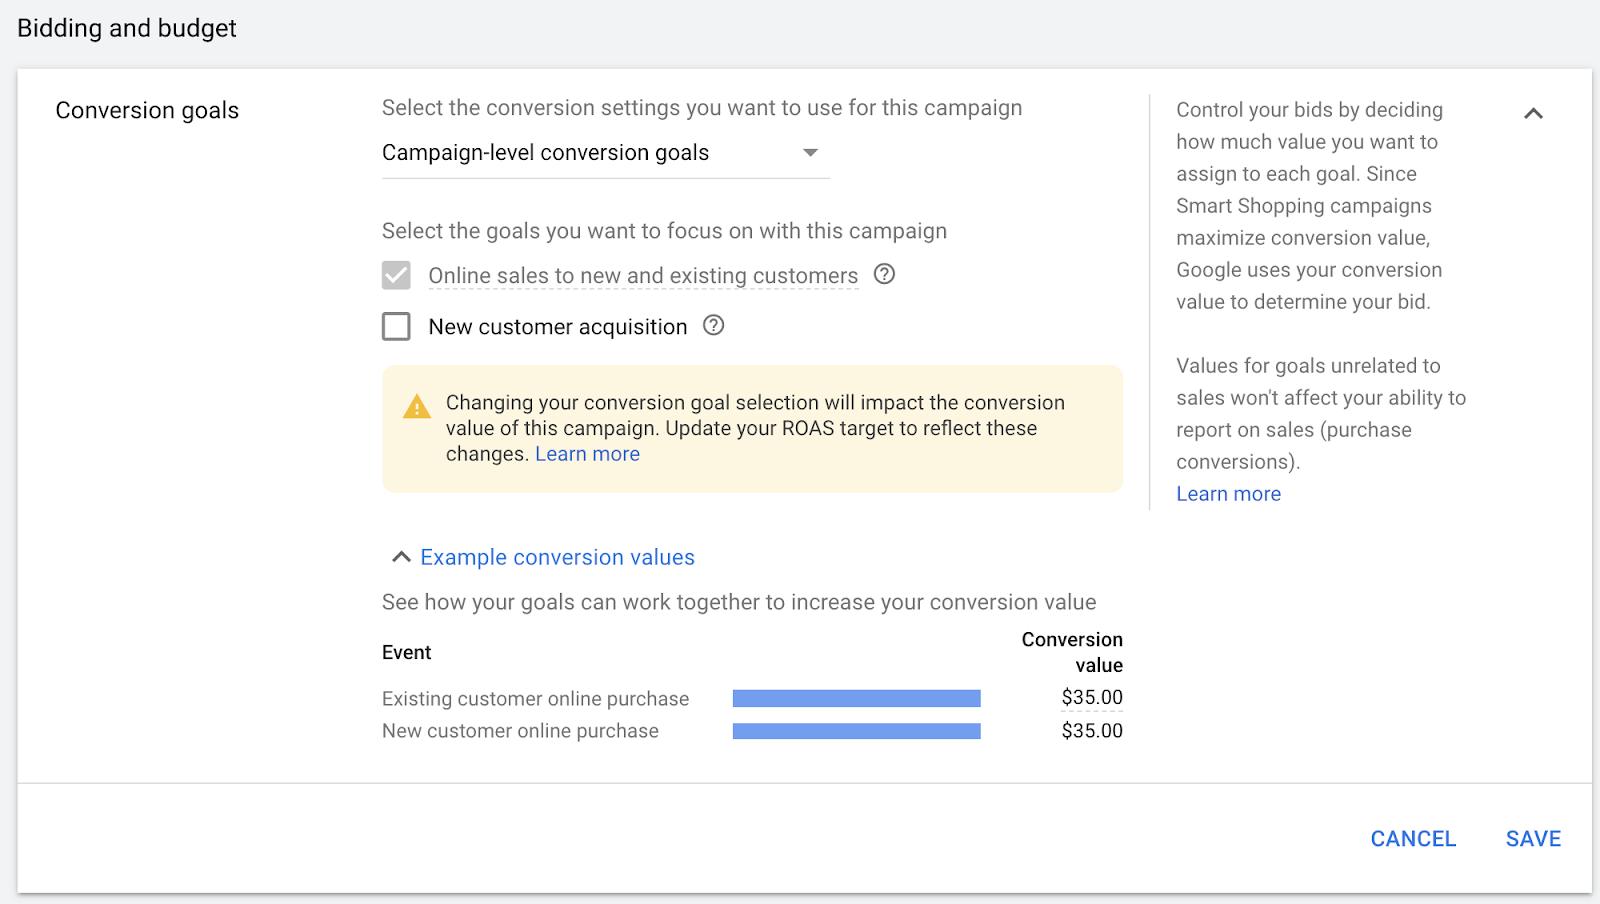 Google smart shopping new vs returning customers